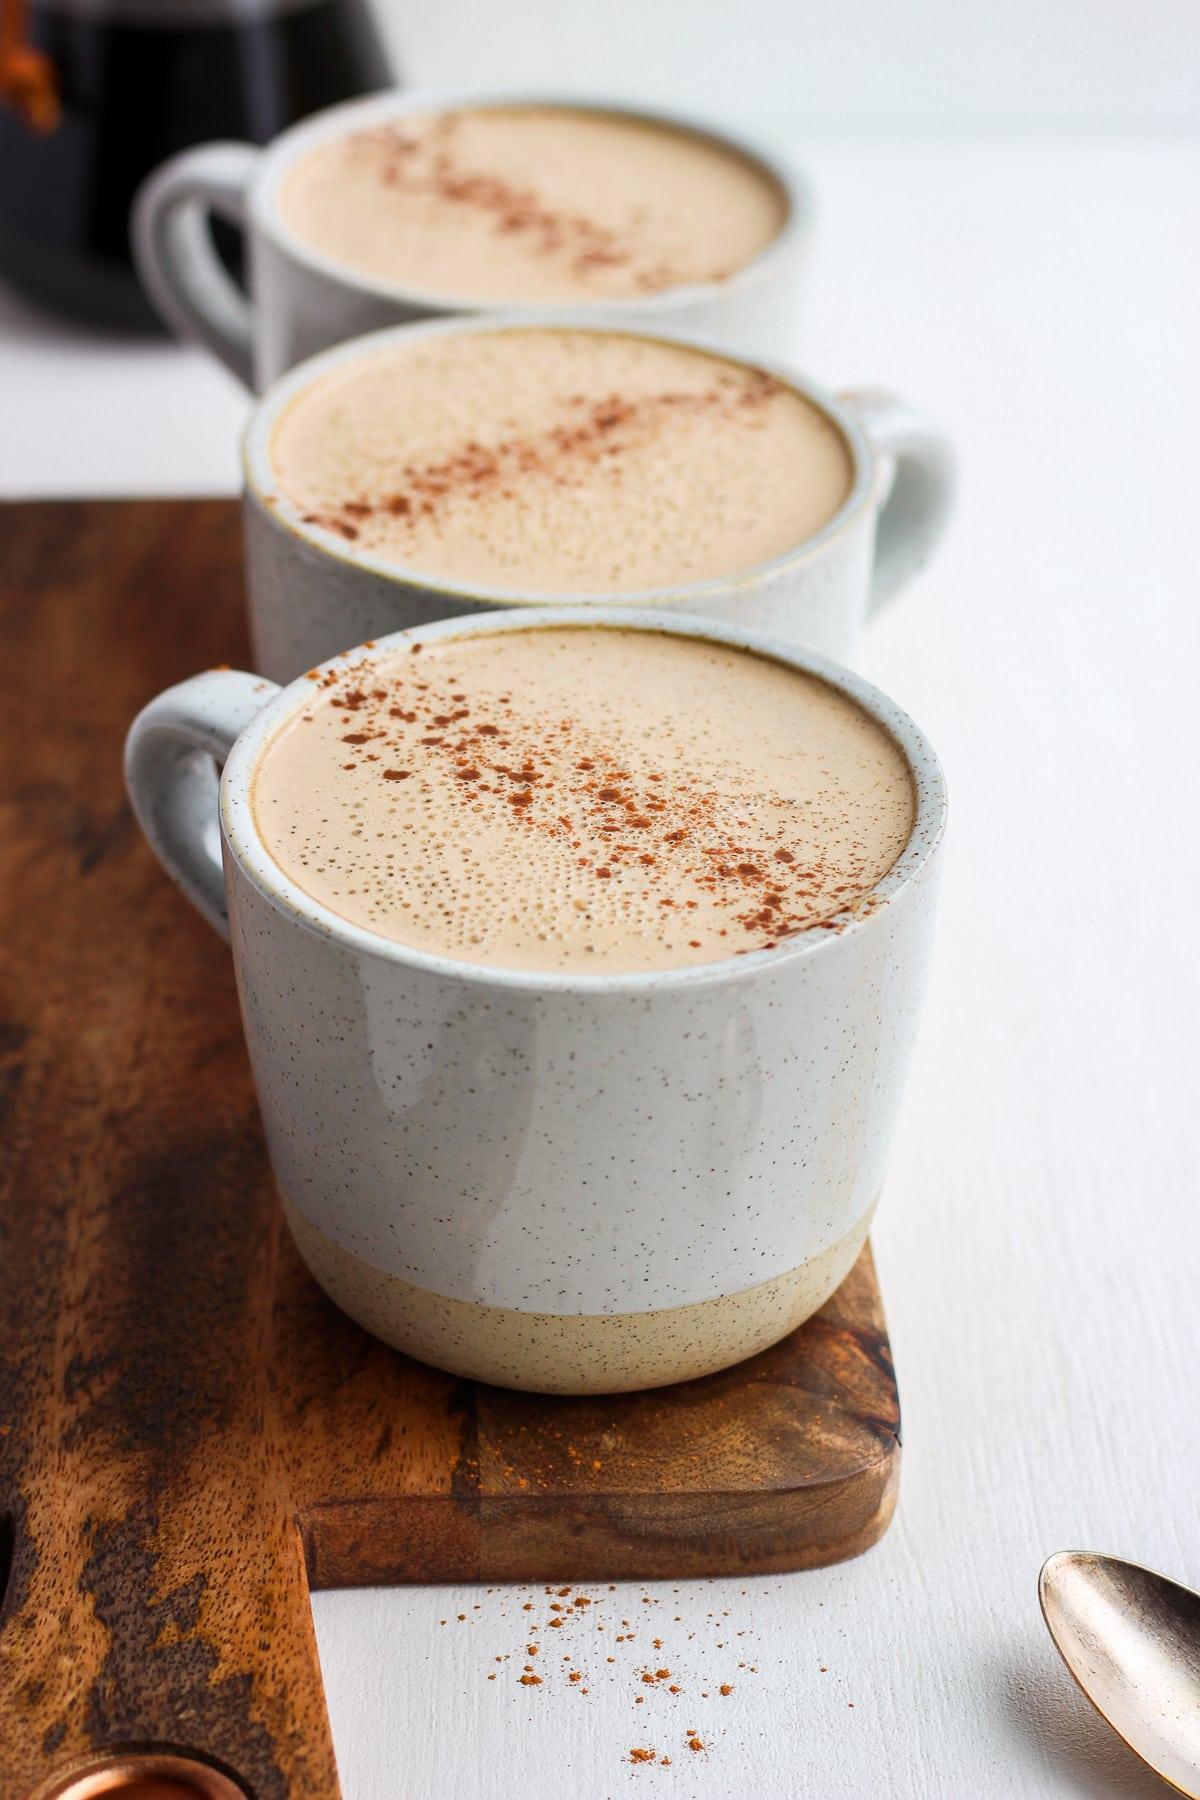 Creamy Cinnamon Cold Brew Cashew Latte - the perfect cup of HOT cold brew with cashew creamer! #whole30 #paleo #coldbrew